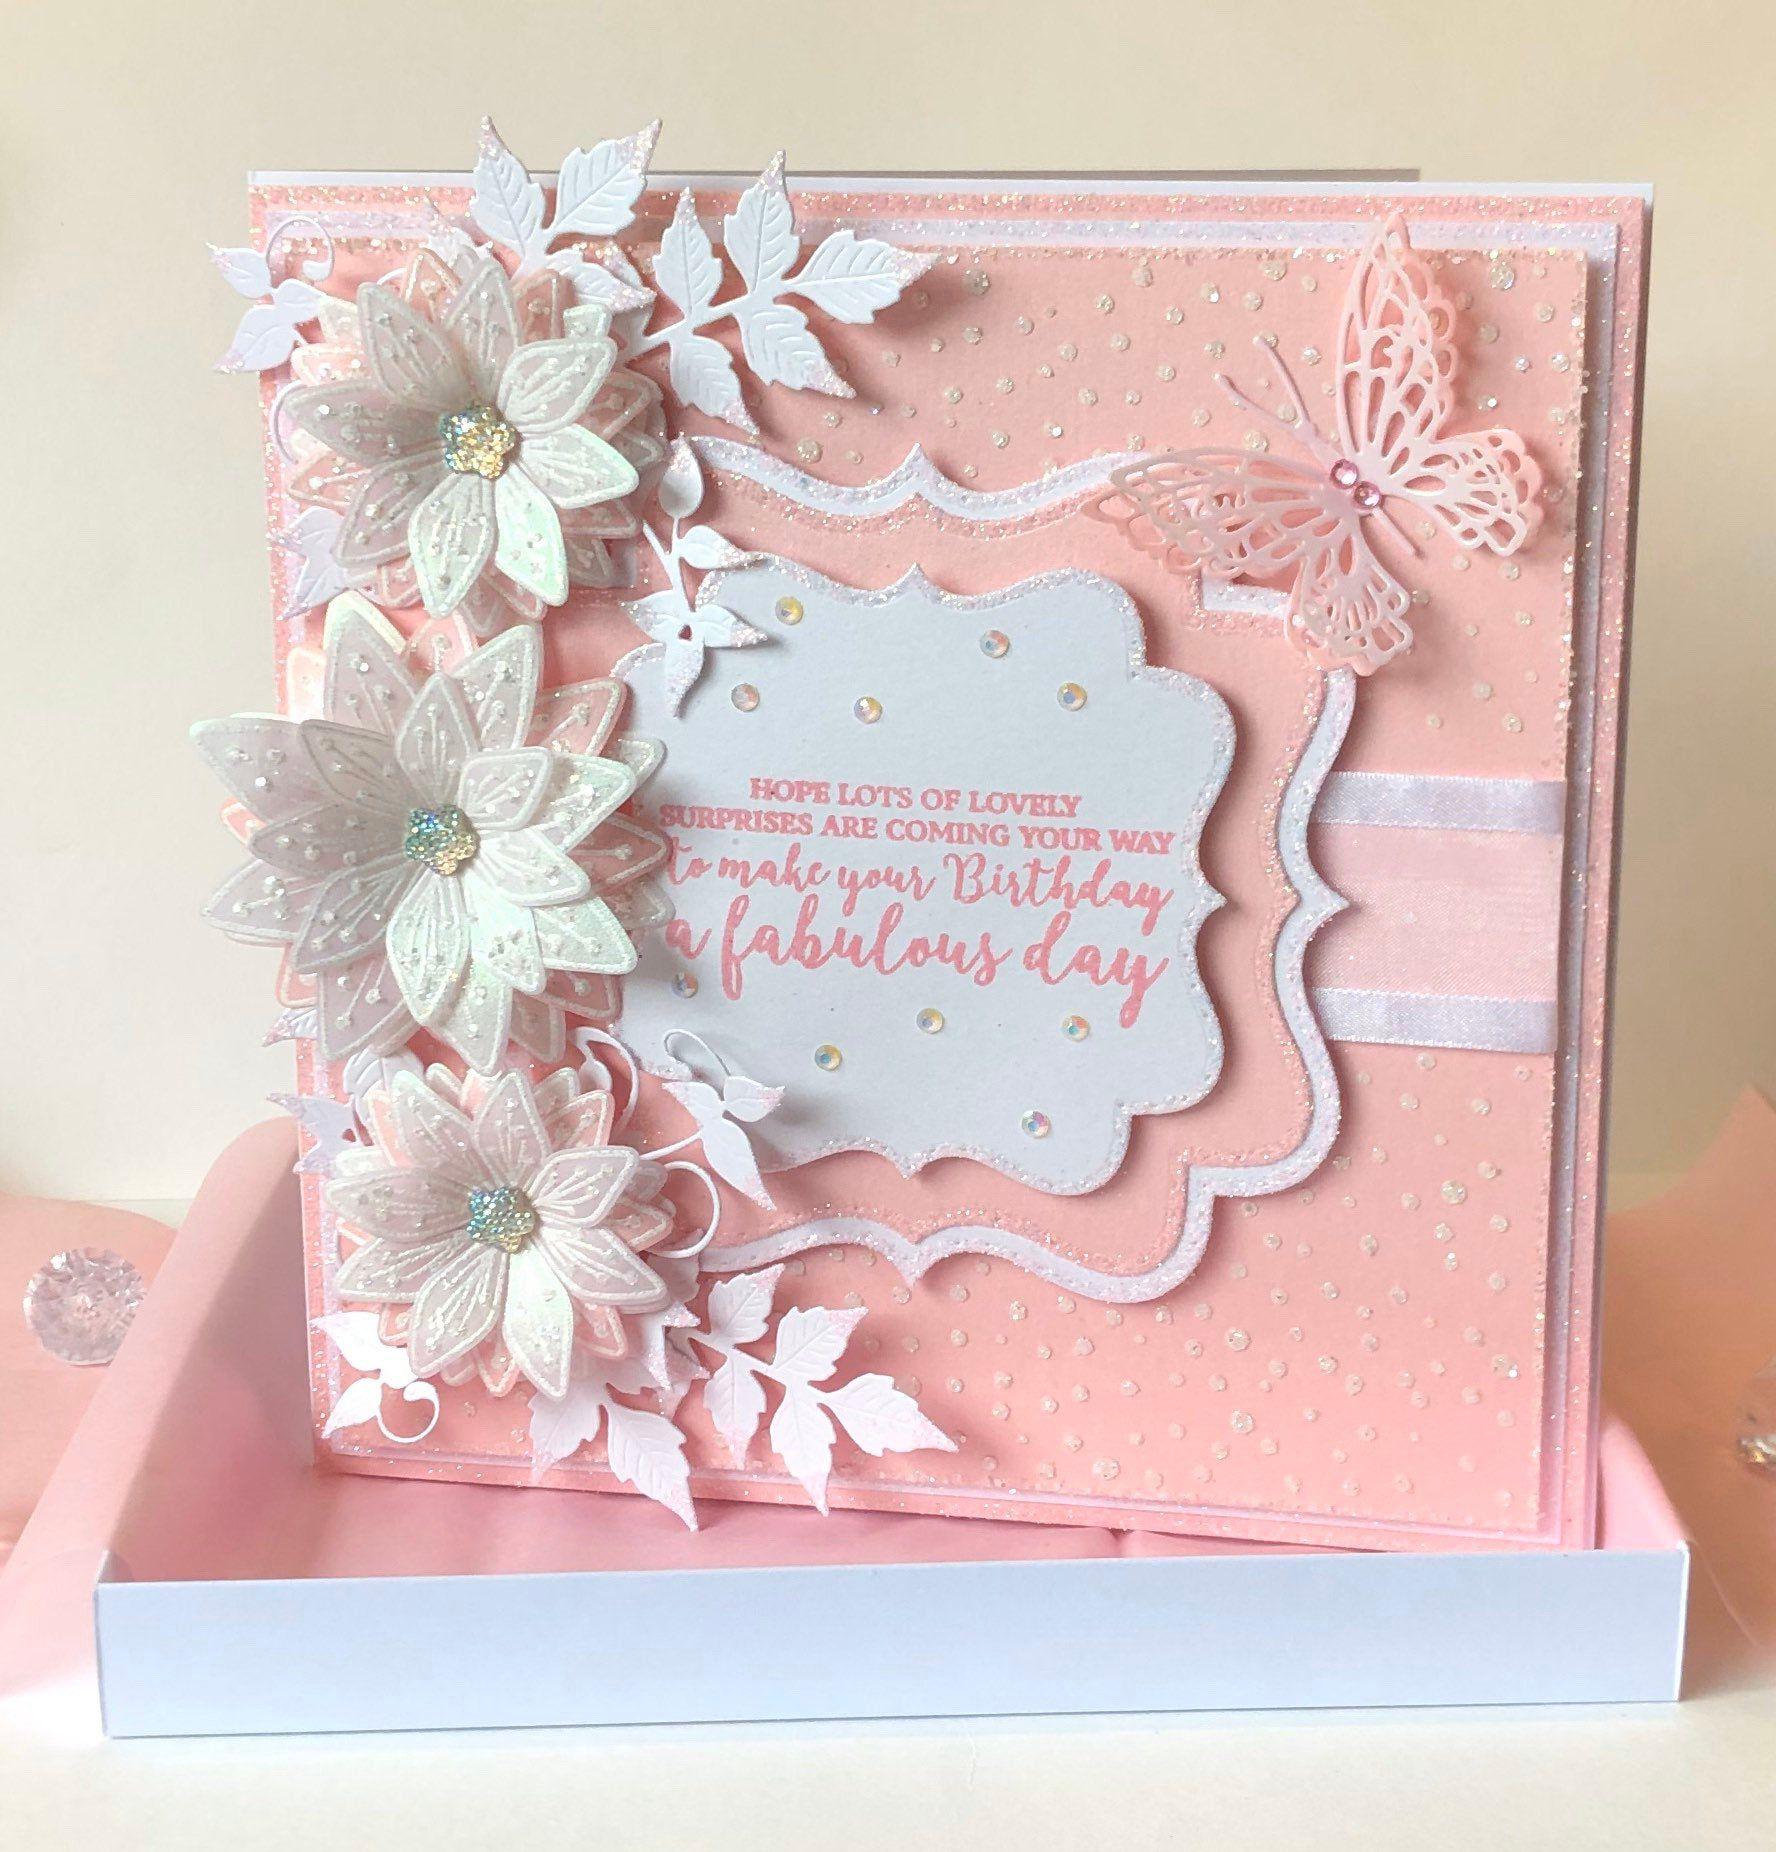 Luxury Handmade Pink Boxed Birthday Card Etsy Chloes Creative Cards Luxury Birthday Cards Birthday Cards Diy